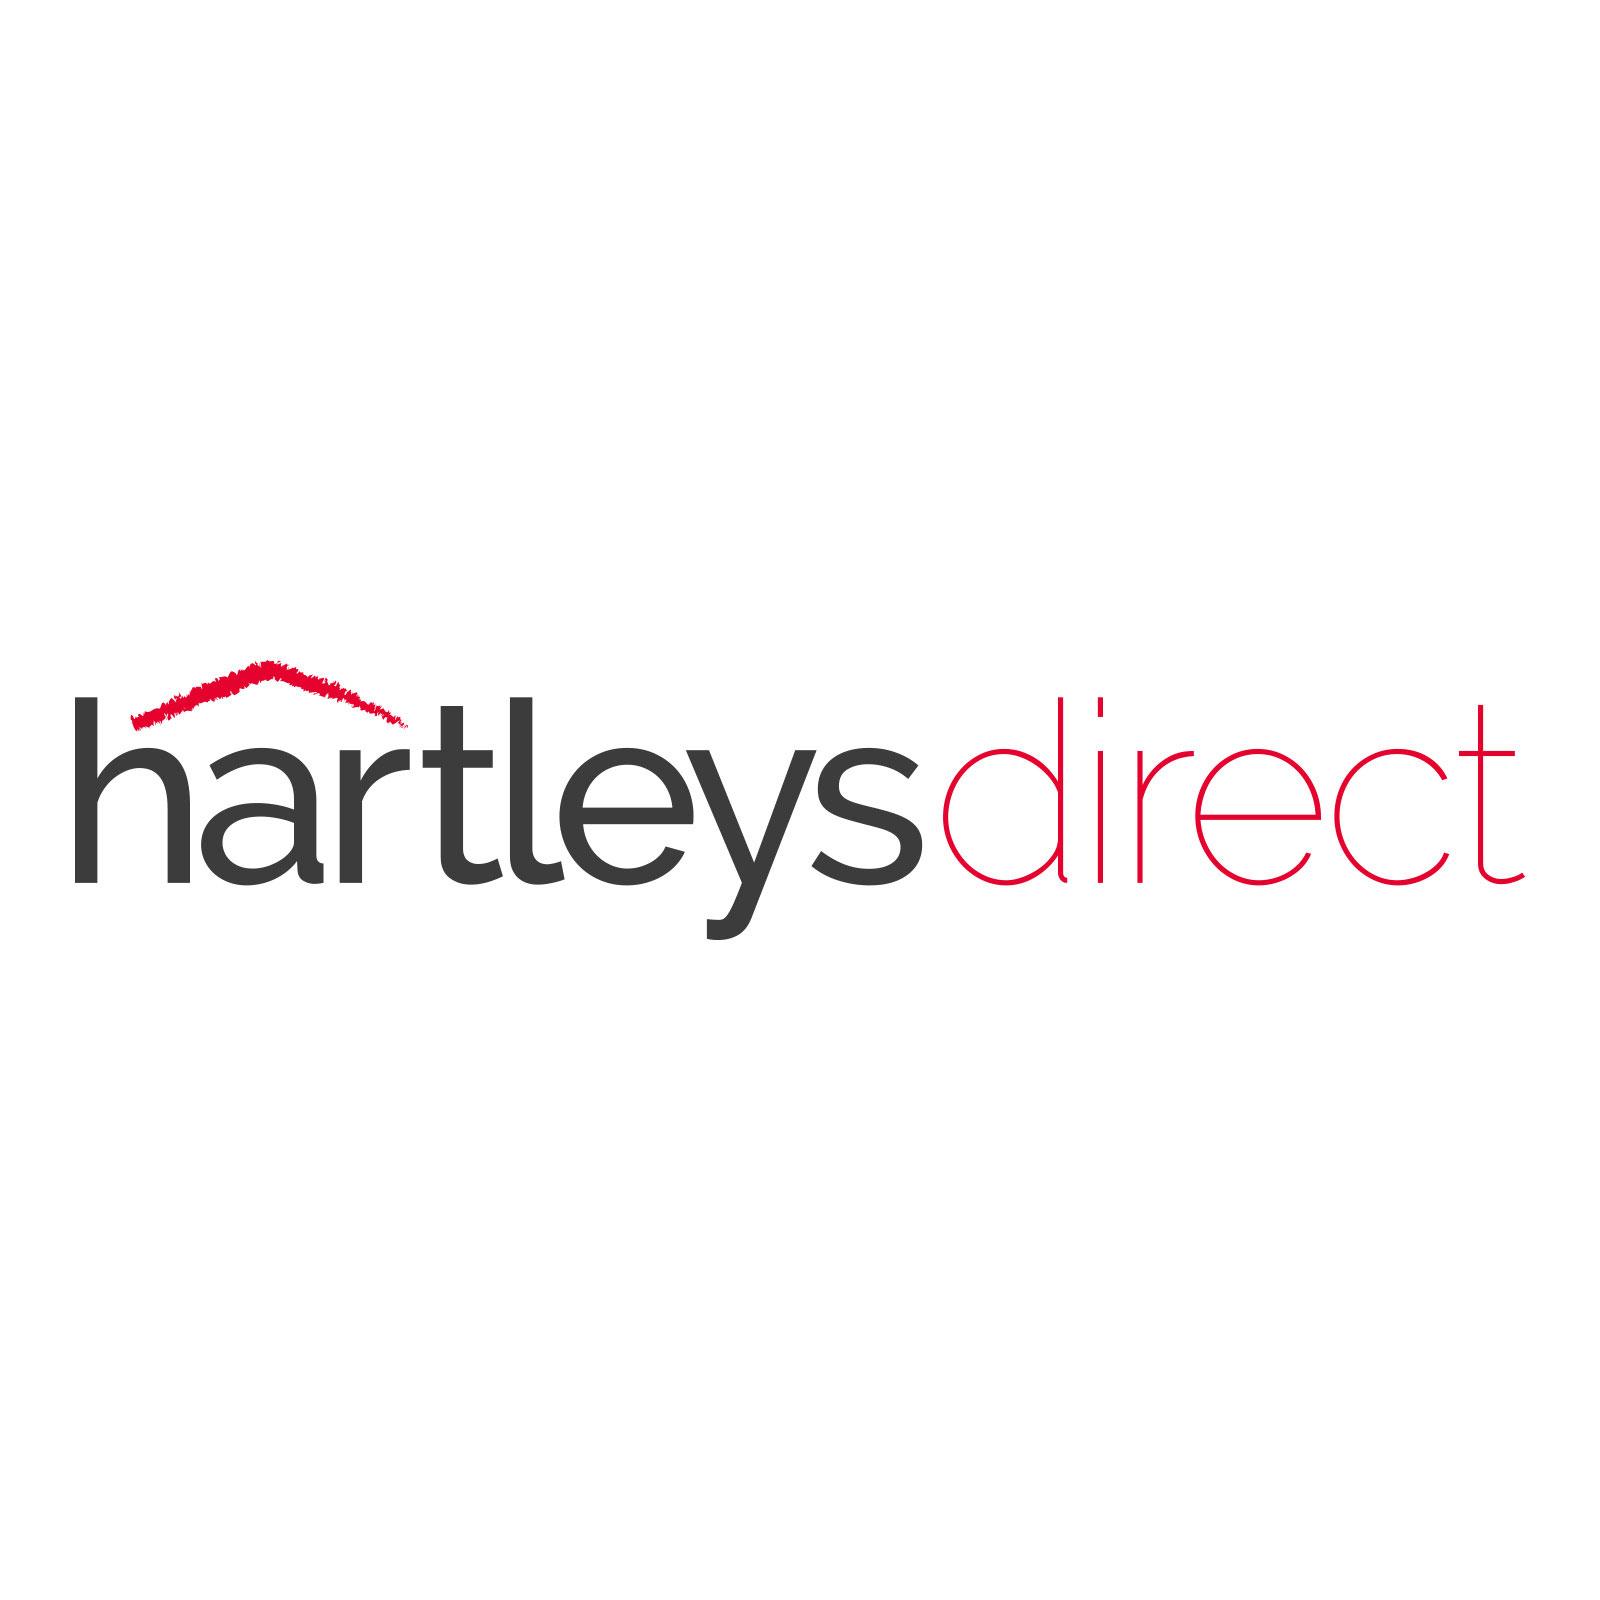 Hartleys 2x2 Seagr Unit Jpg